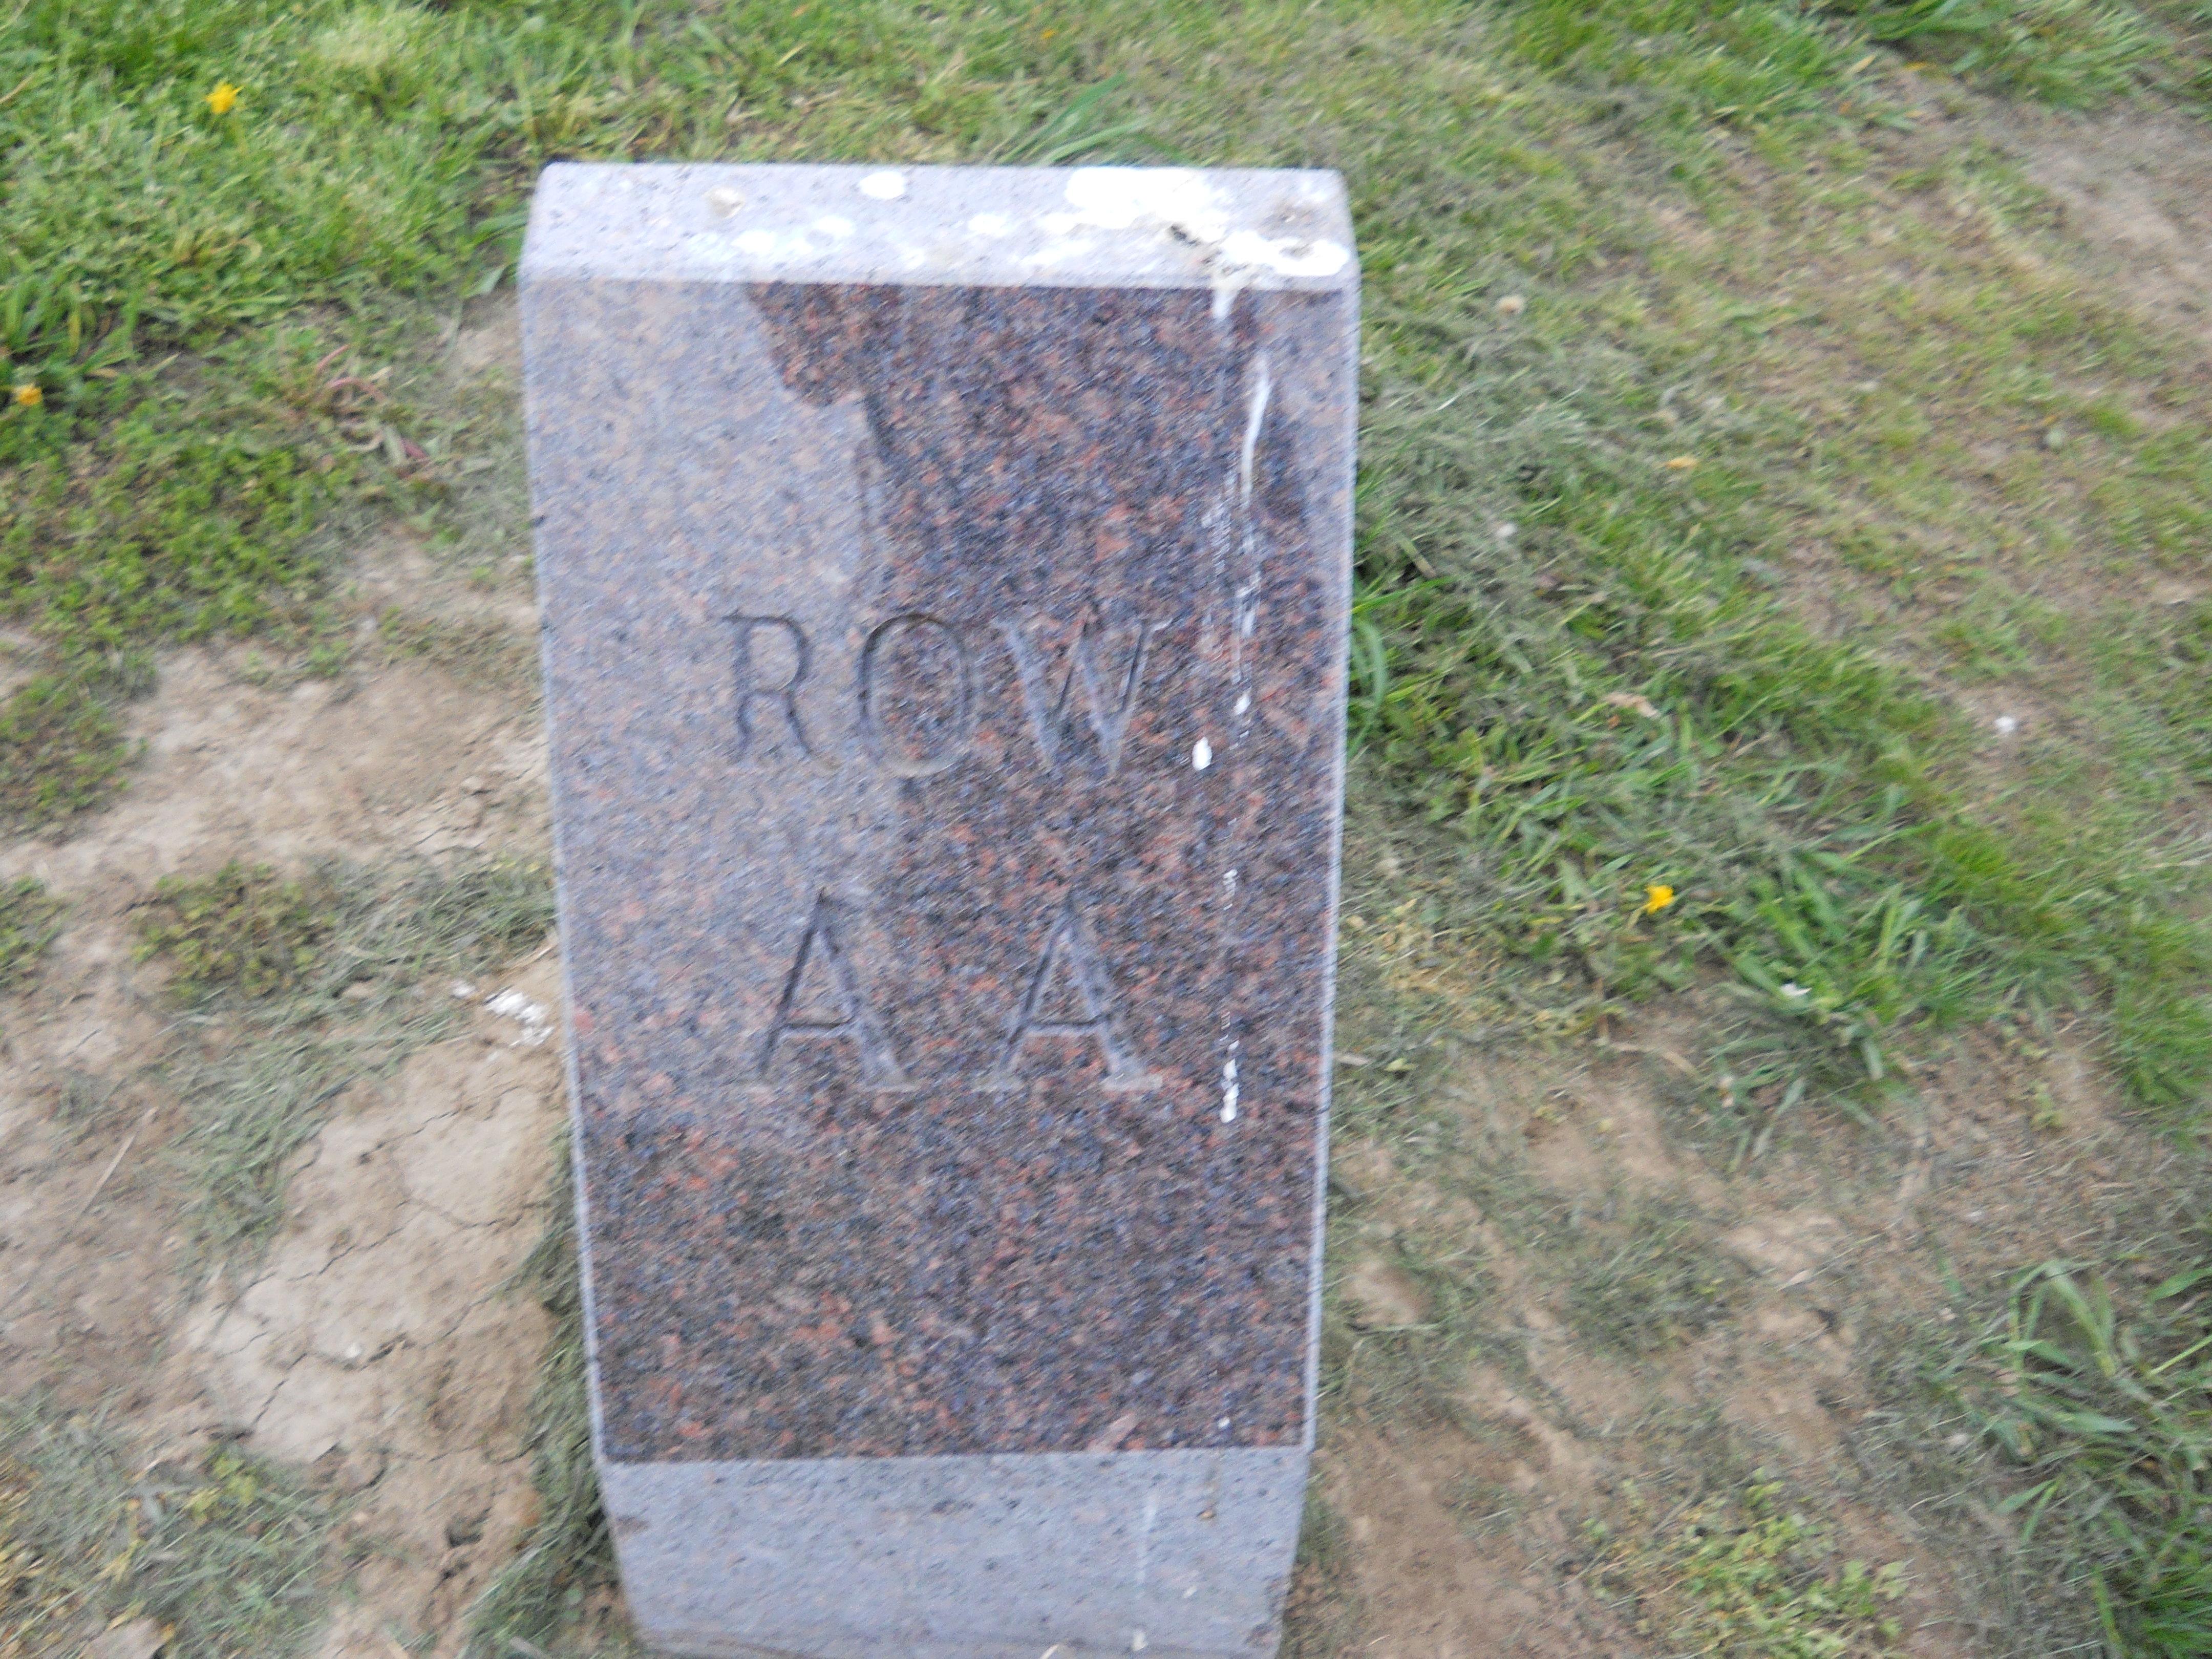 Modern row marker AA.